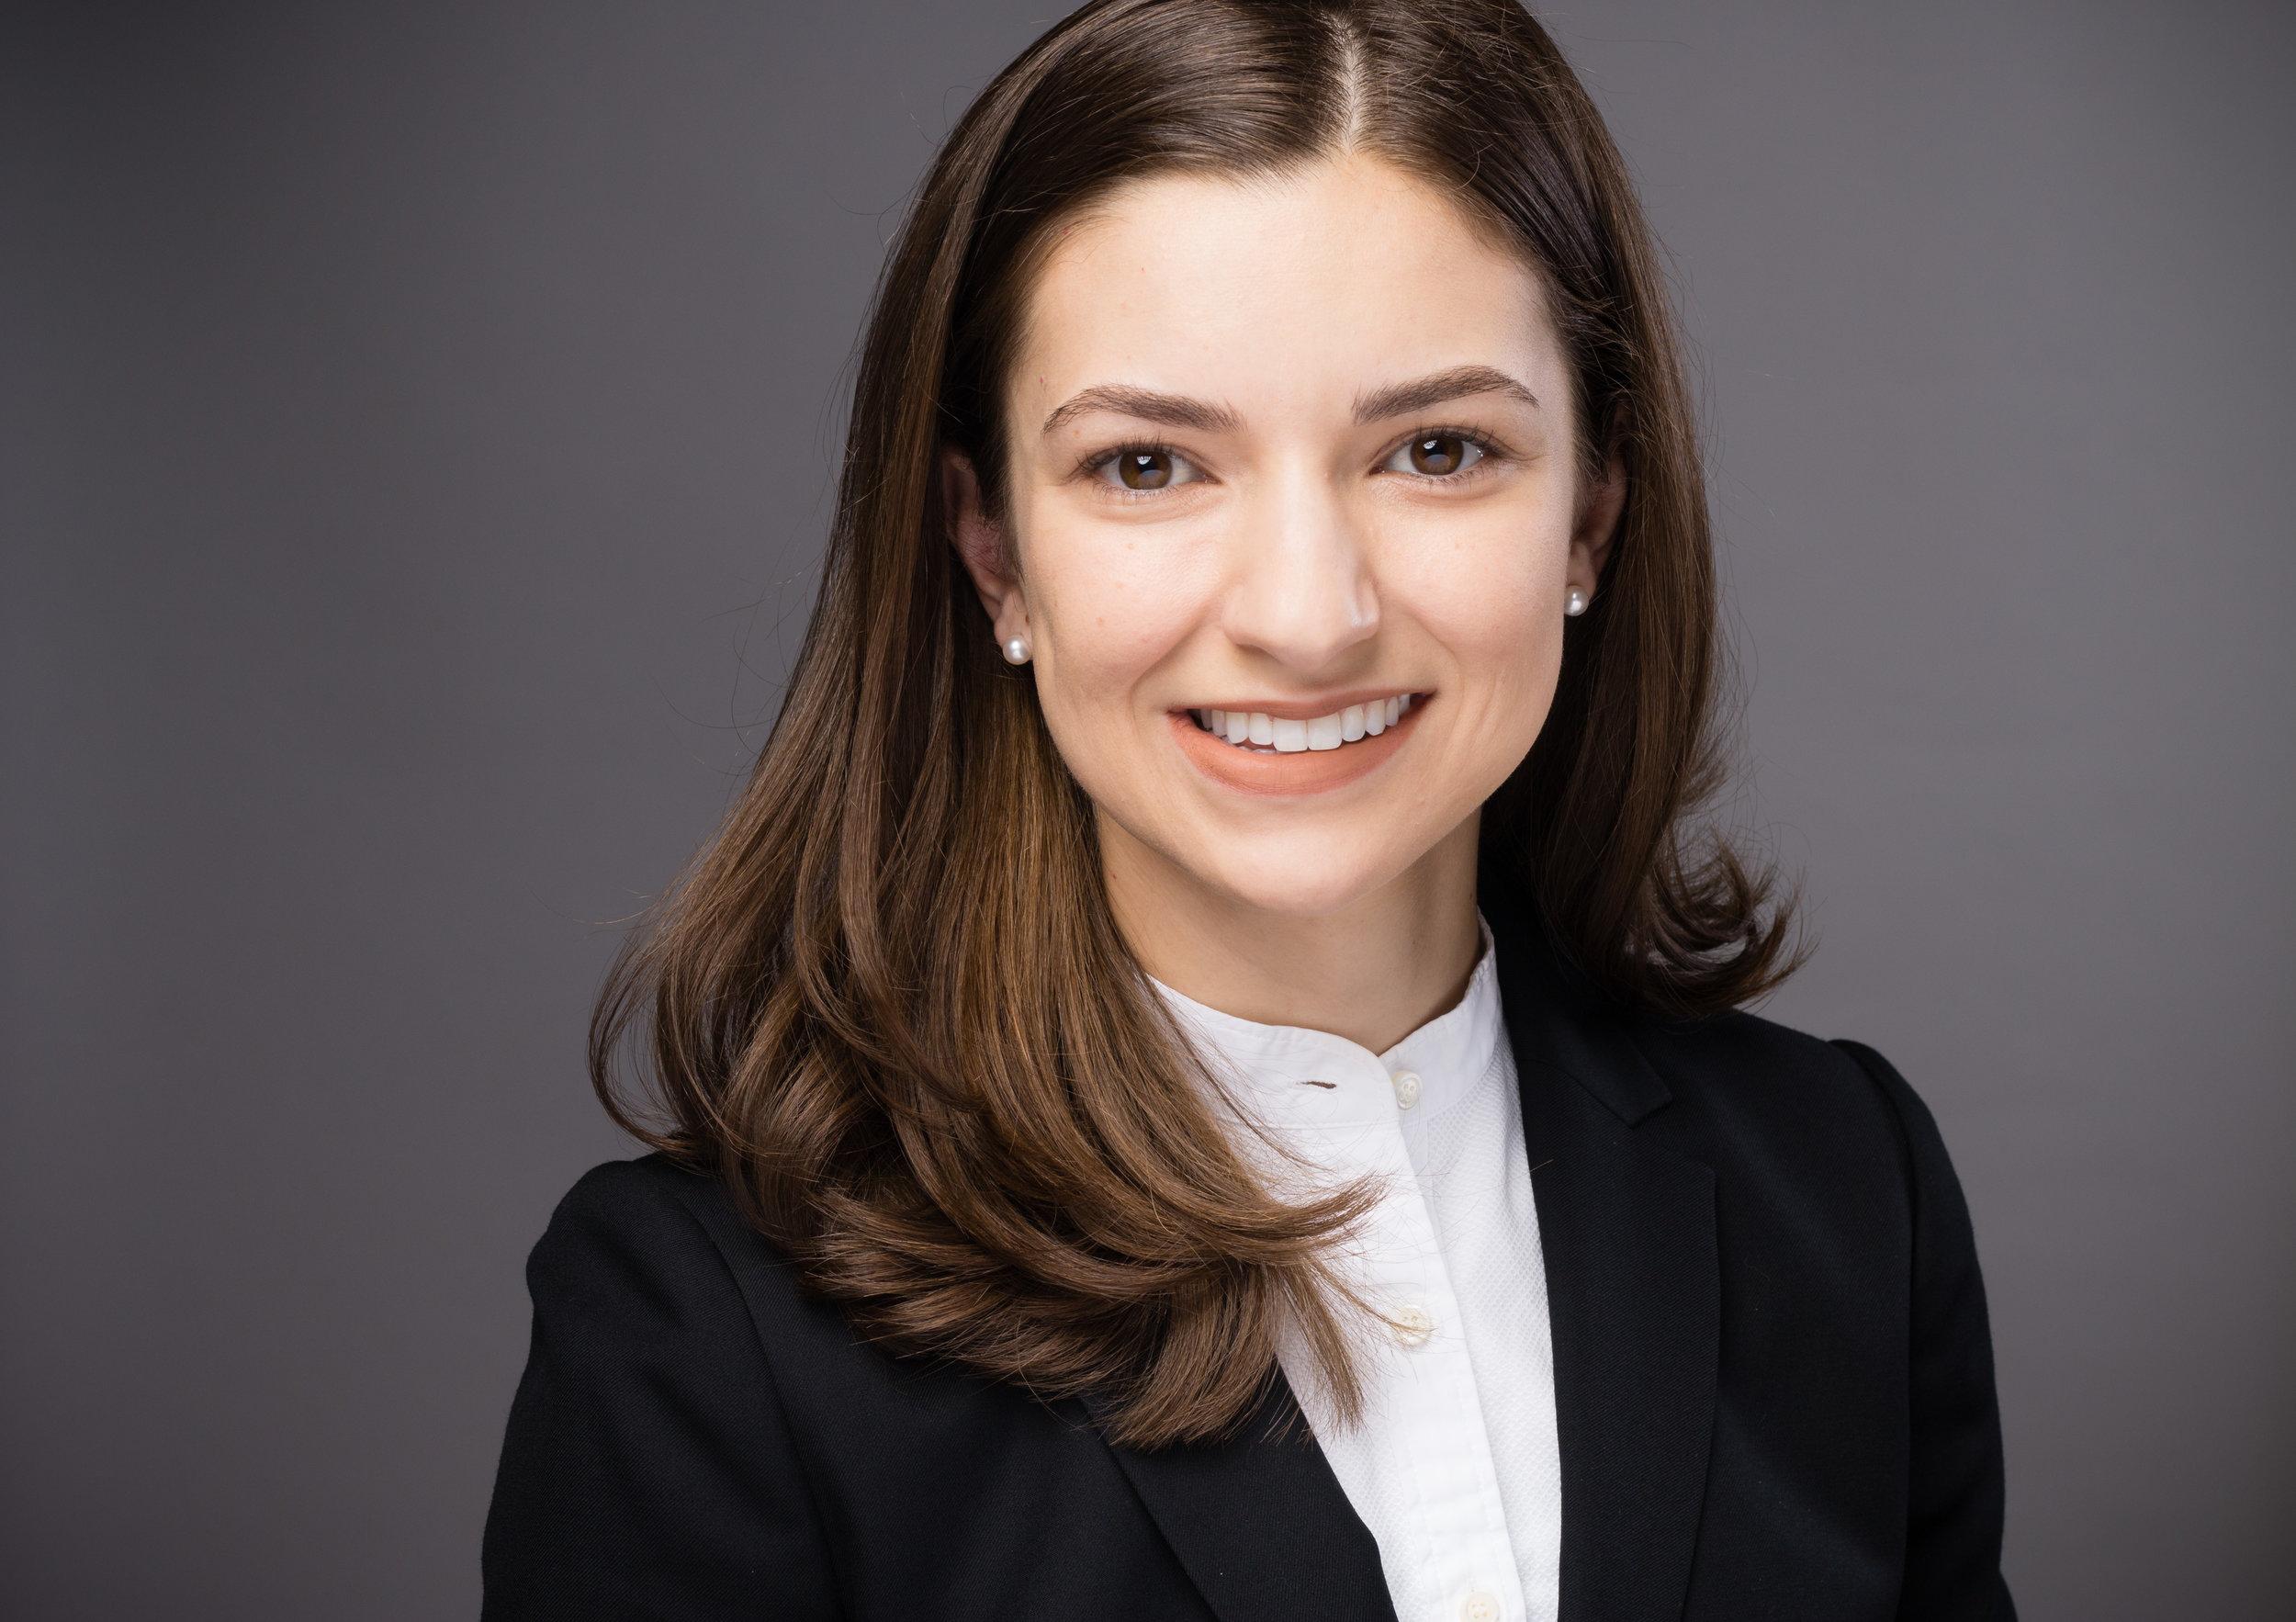 Atlanta Corporate Executive Headshot